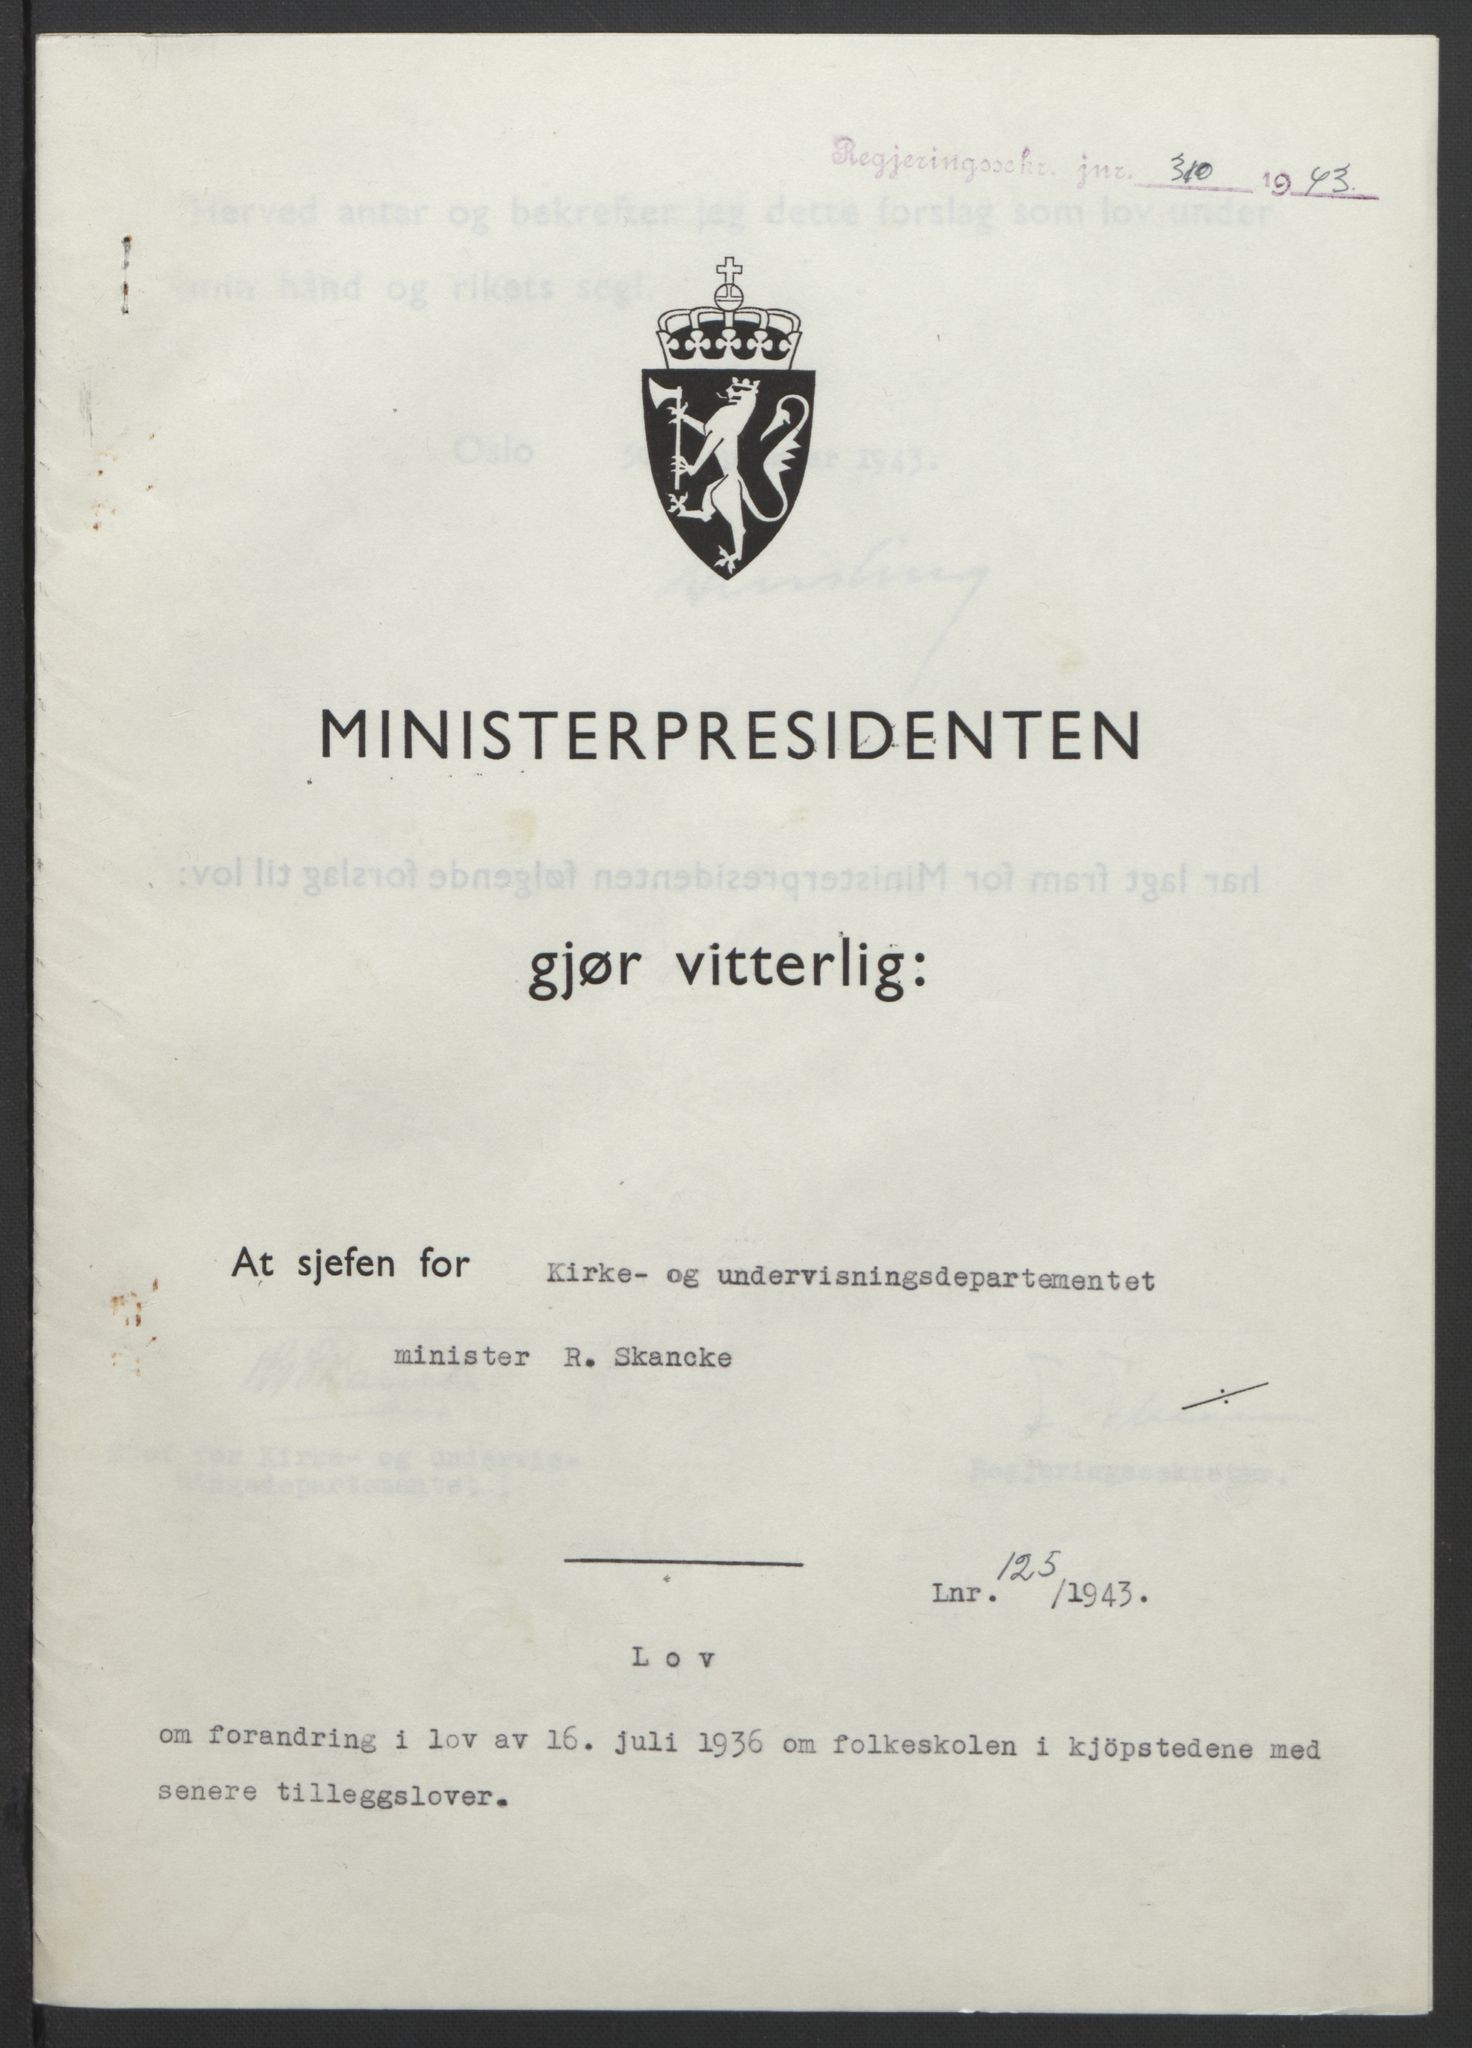 RA, NS-administrasjonen 1940-1945 (Statsrådsekretariatet, de kommisariske statsråder mm), D/Db/L0099: Lover, 1943, s. 580